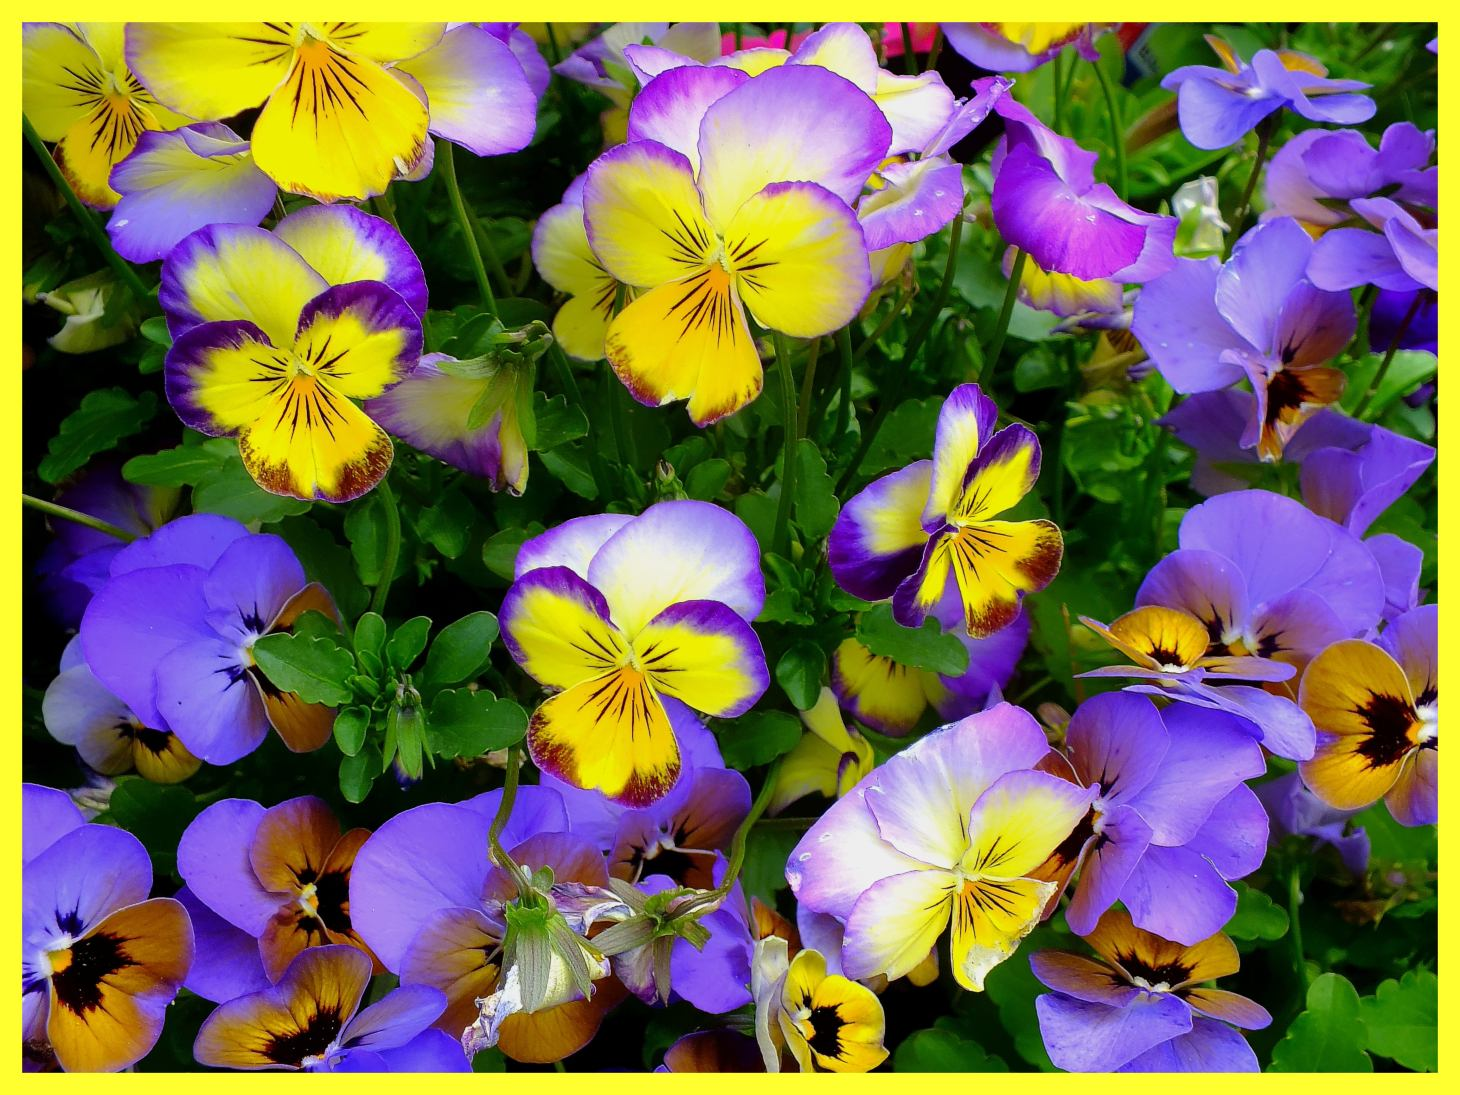 Viola Flowers.  Photo by Thomas Peace c. 2015